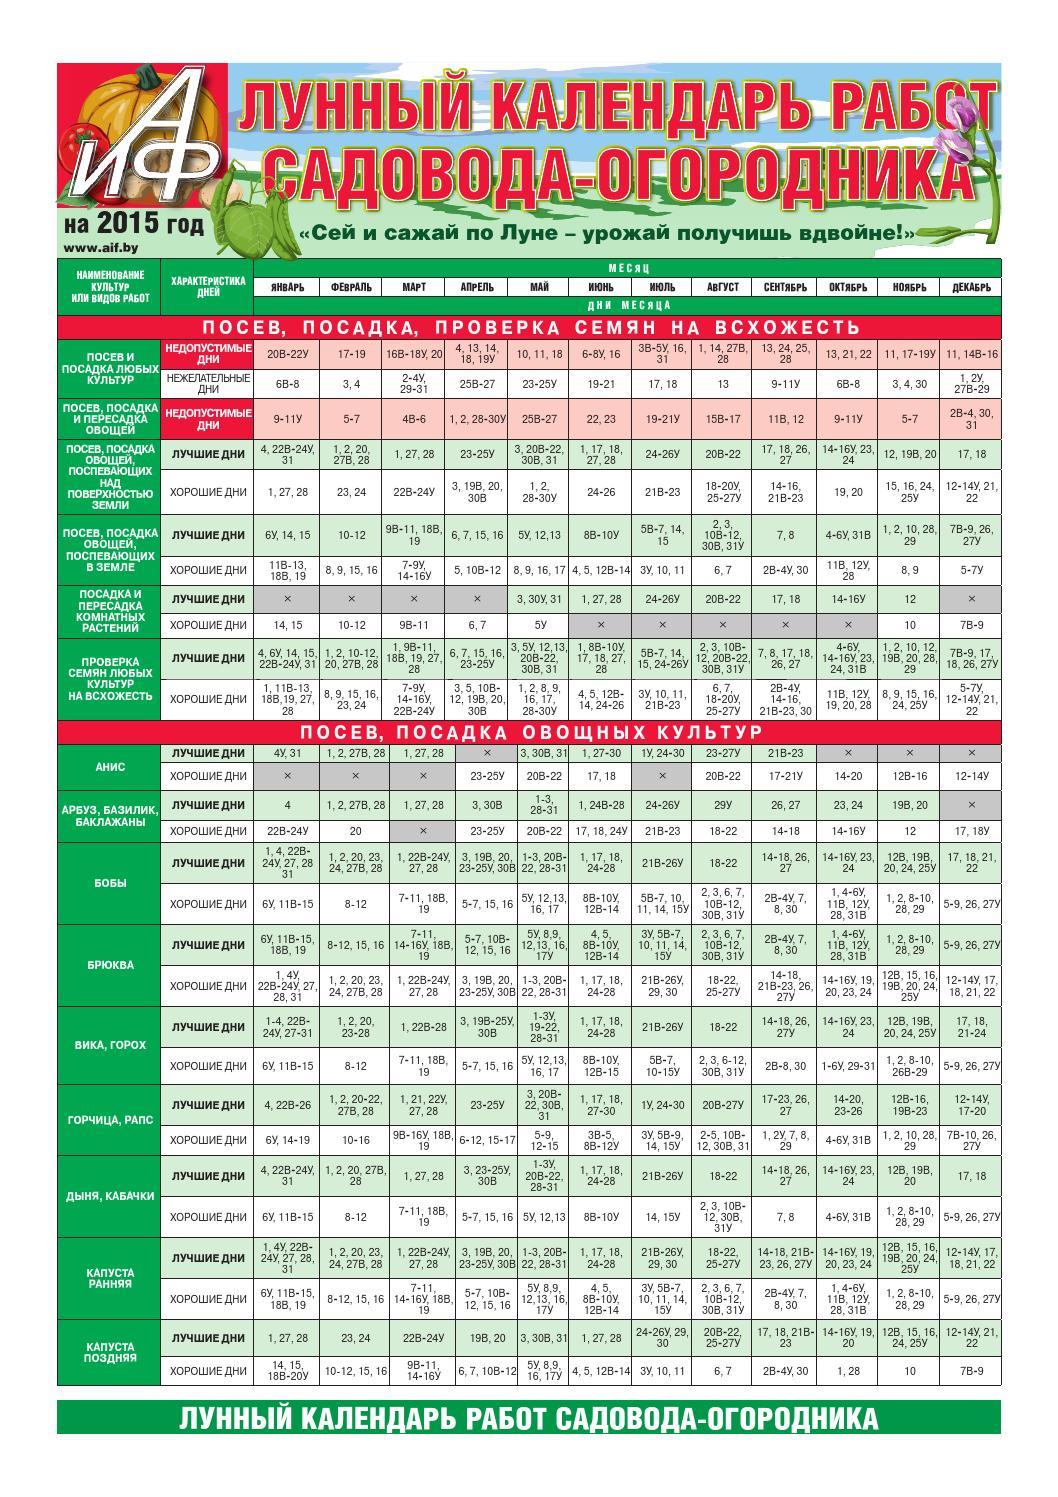 Календарь фаз луны на ноябрь 2013